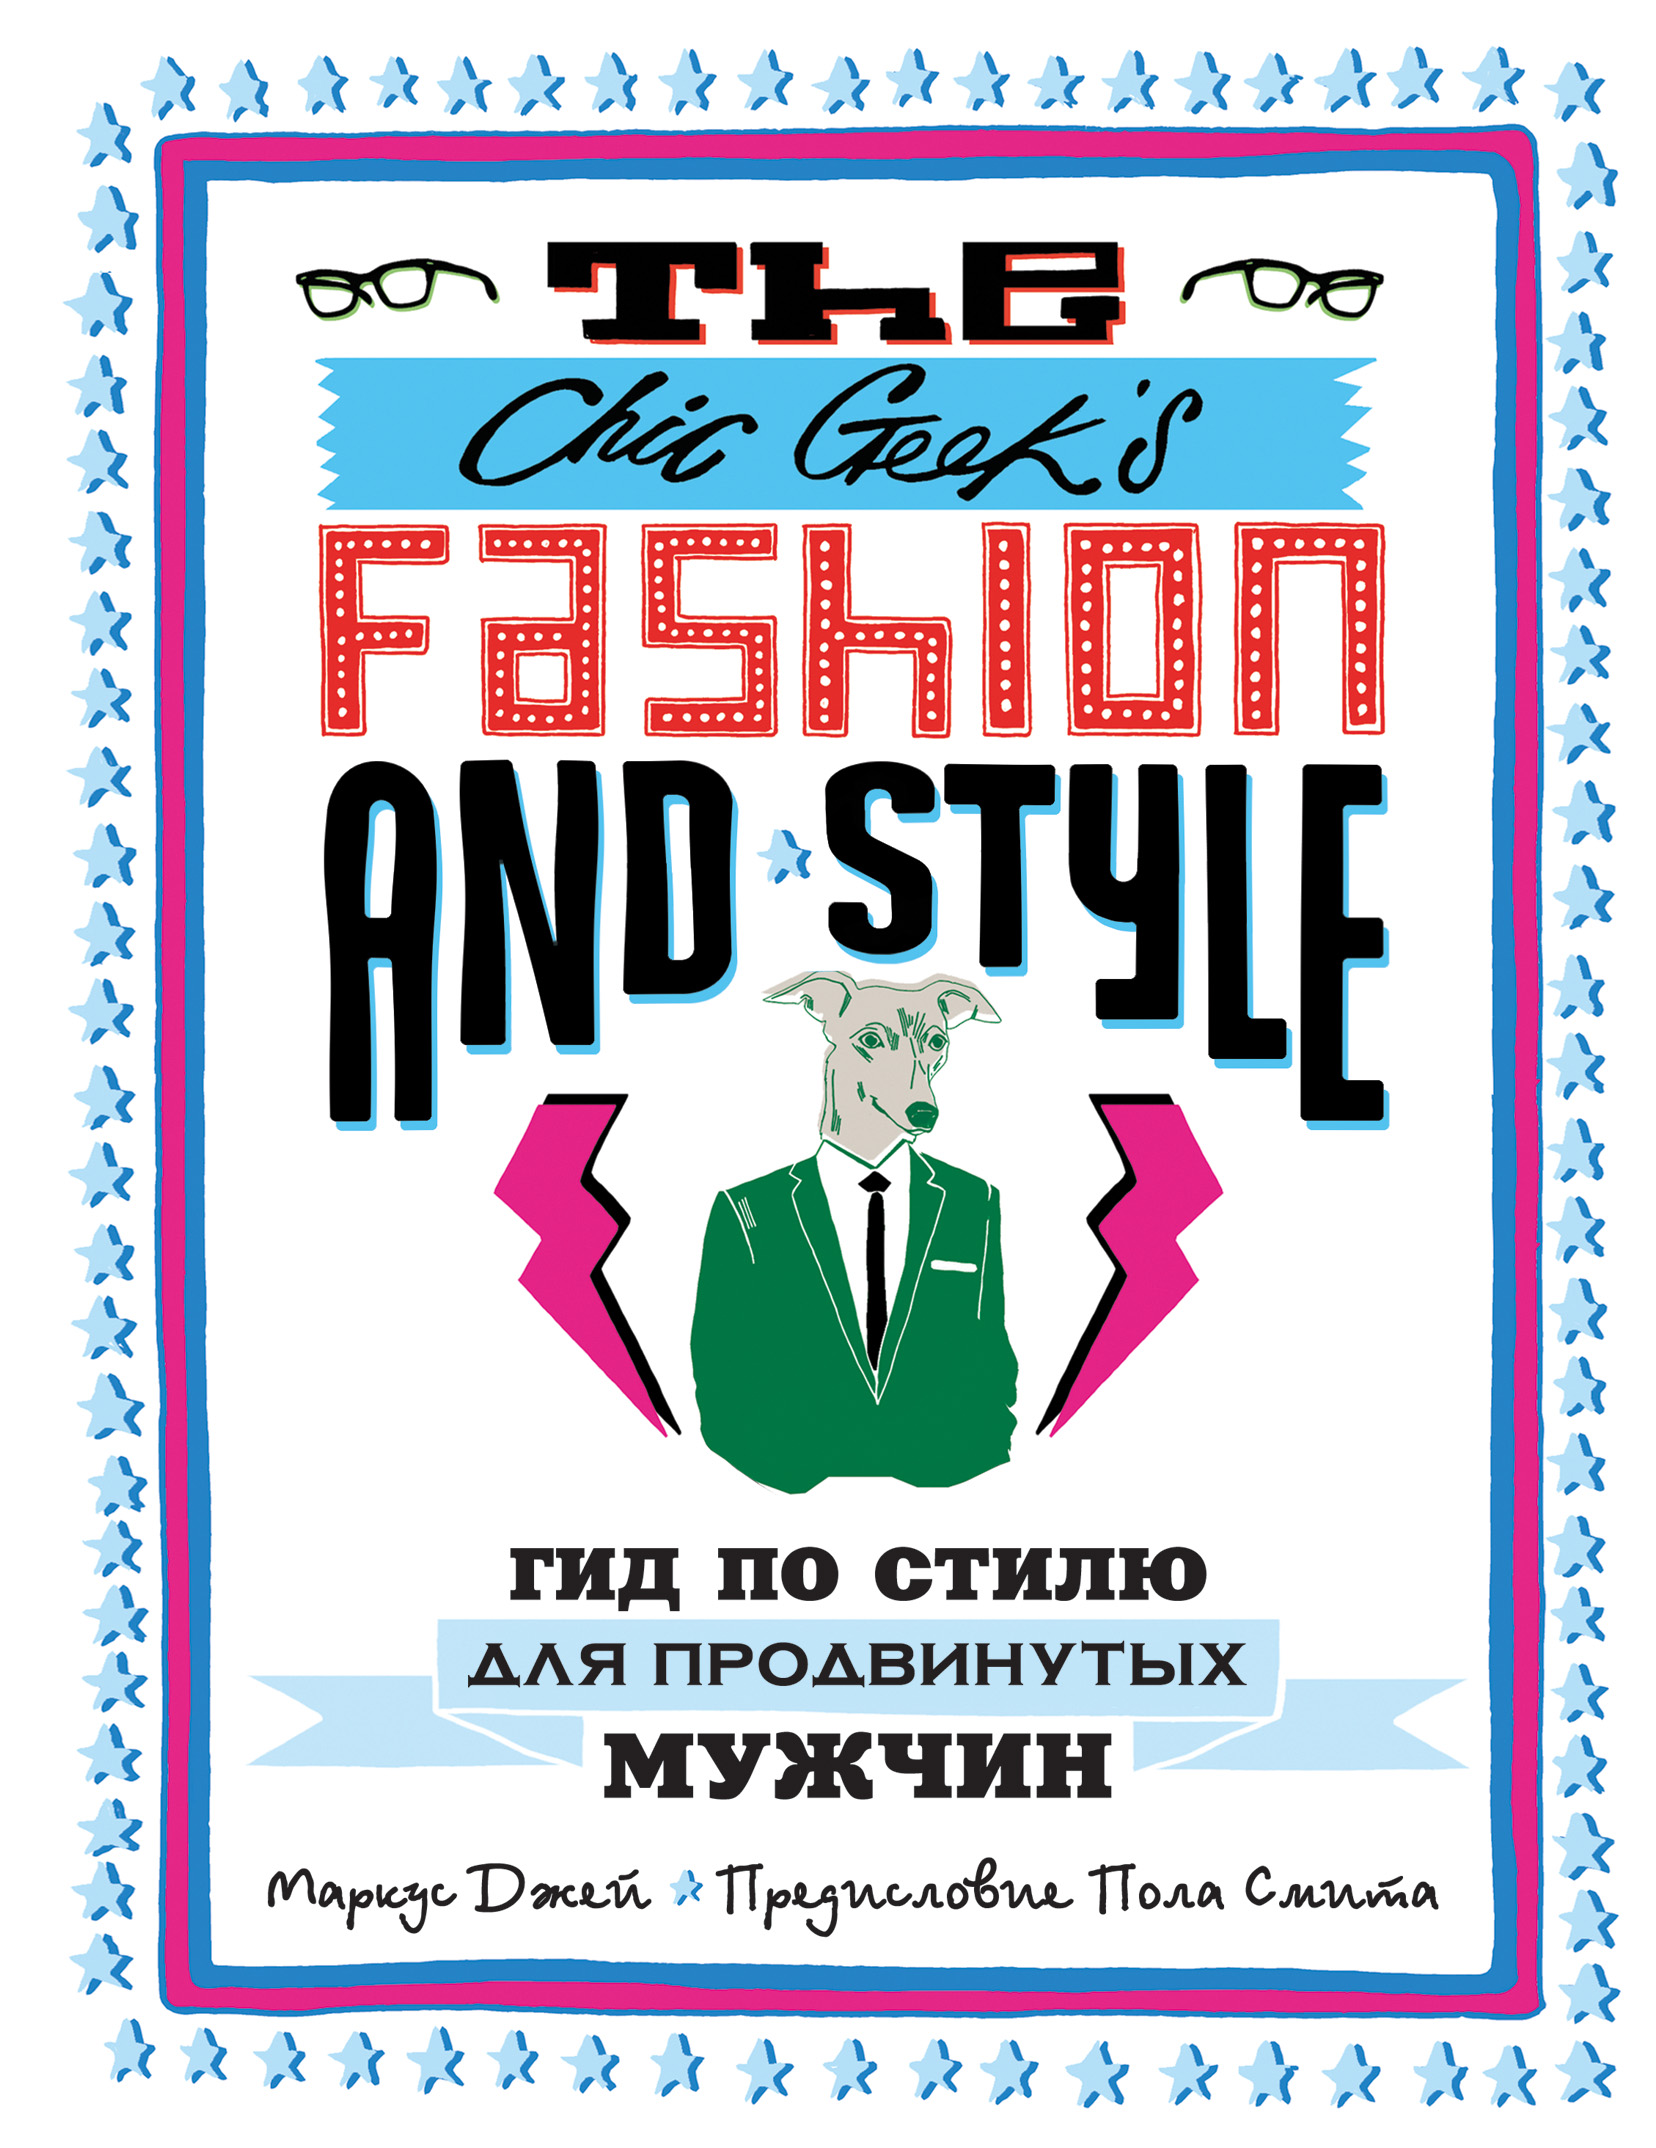 Джей М. The Chic Geek's Fashion & Style. Гид по стилю для продвинутых мужчин (KRASOTA. Быть джентльменом) ISBN: 978-5-699-59666-9 джей м the chic geek s fashion href page 2